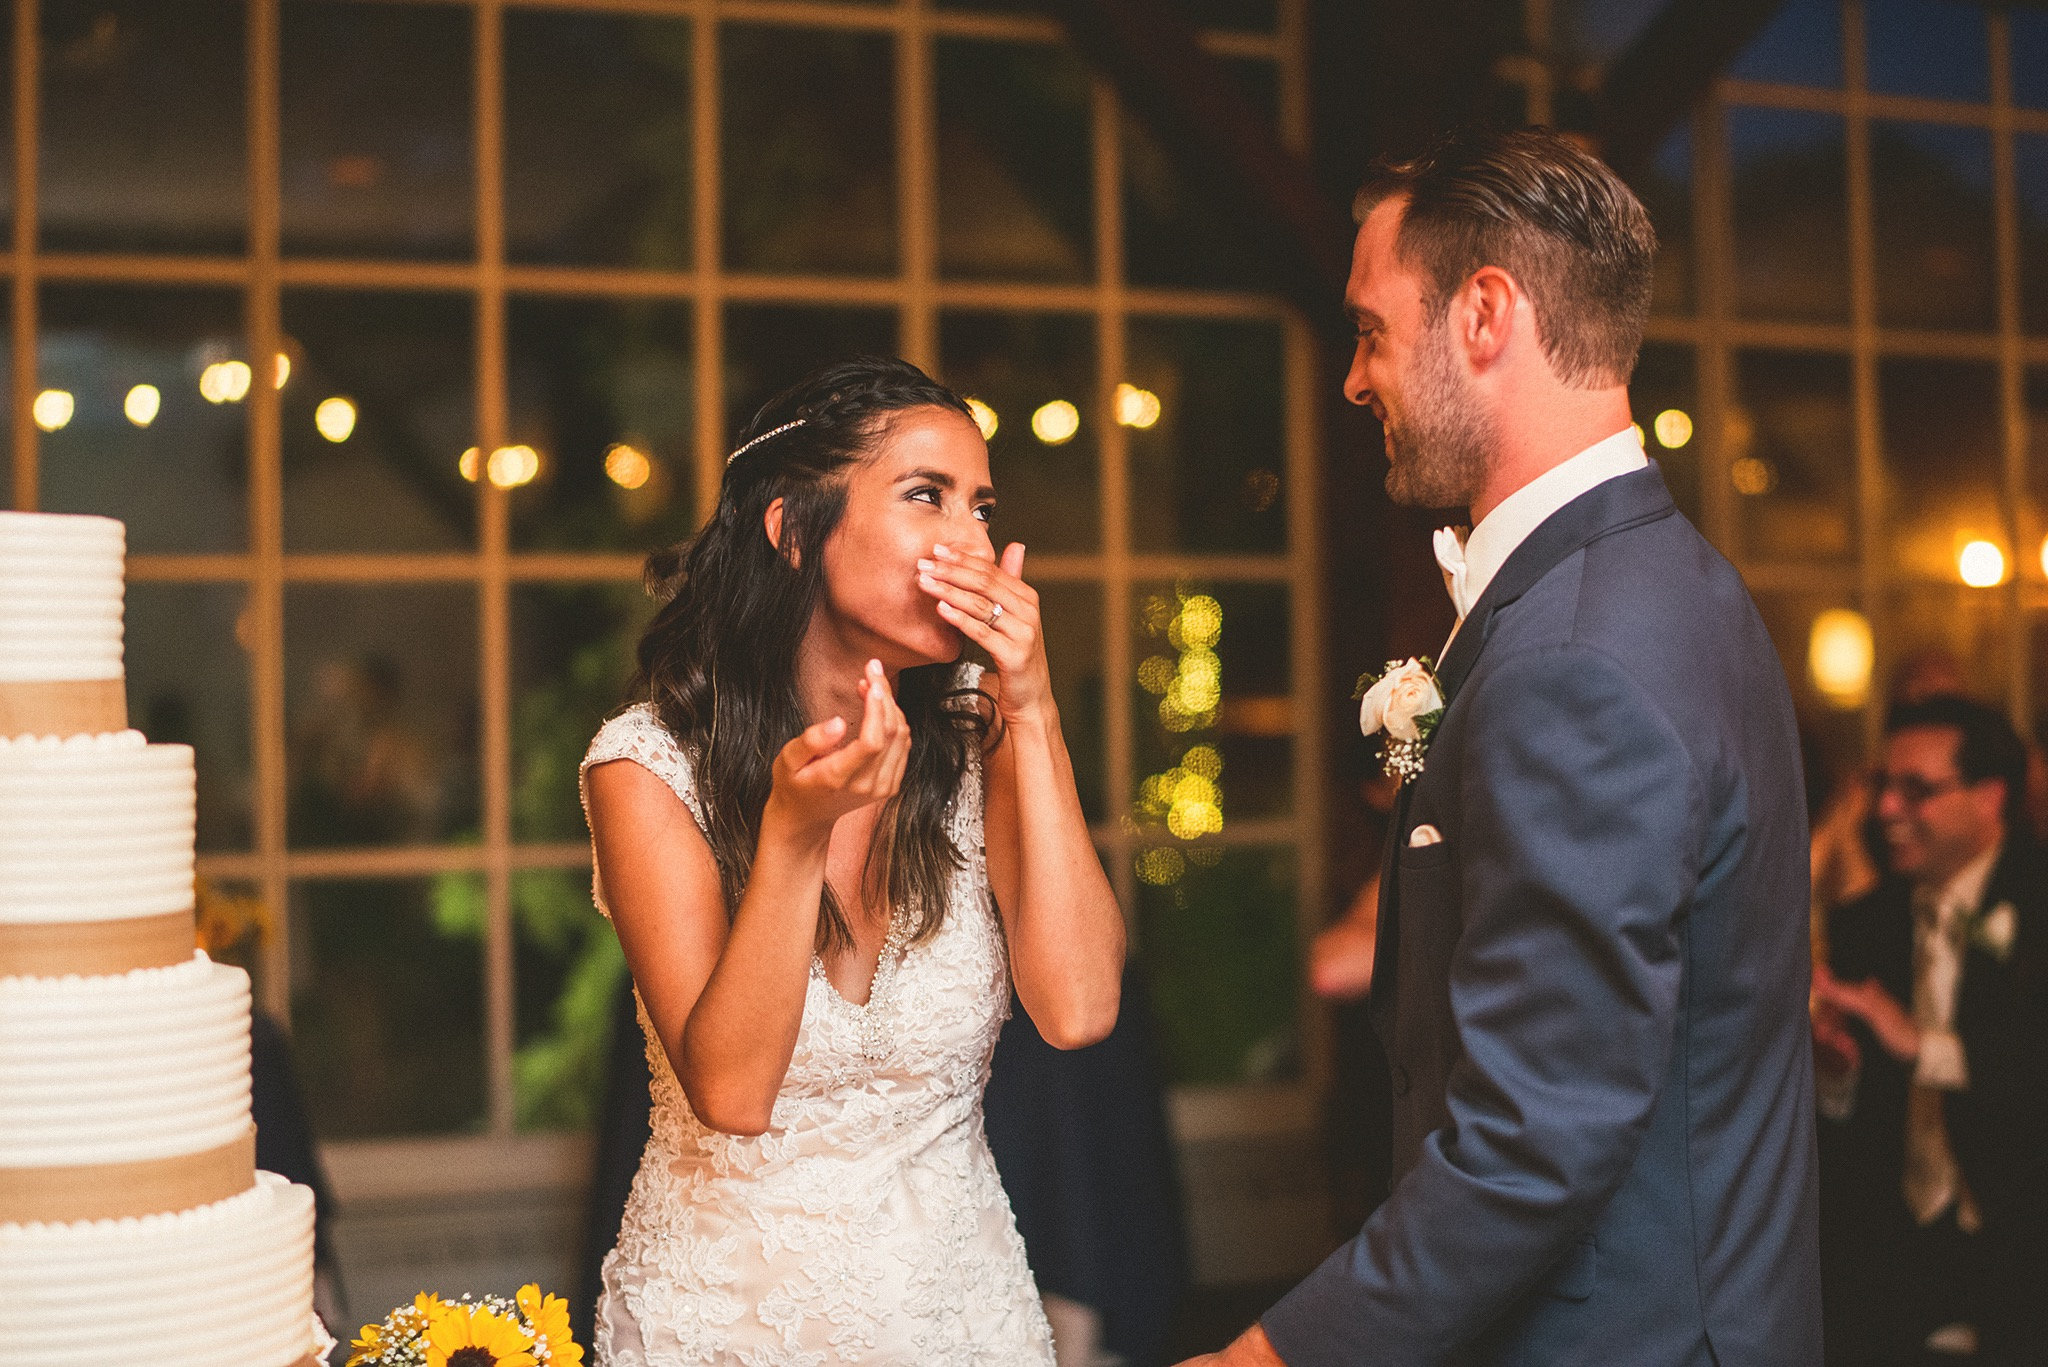 79-wedding-reception-candids.jpg